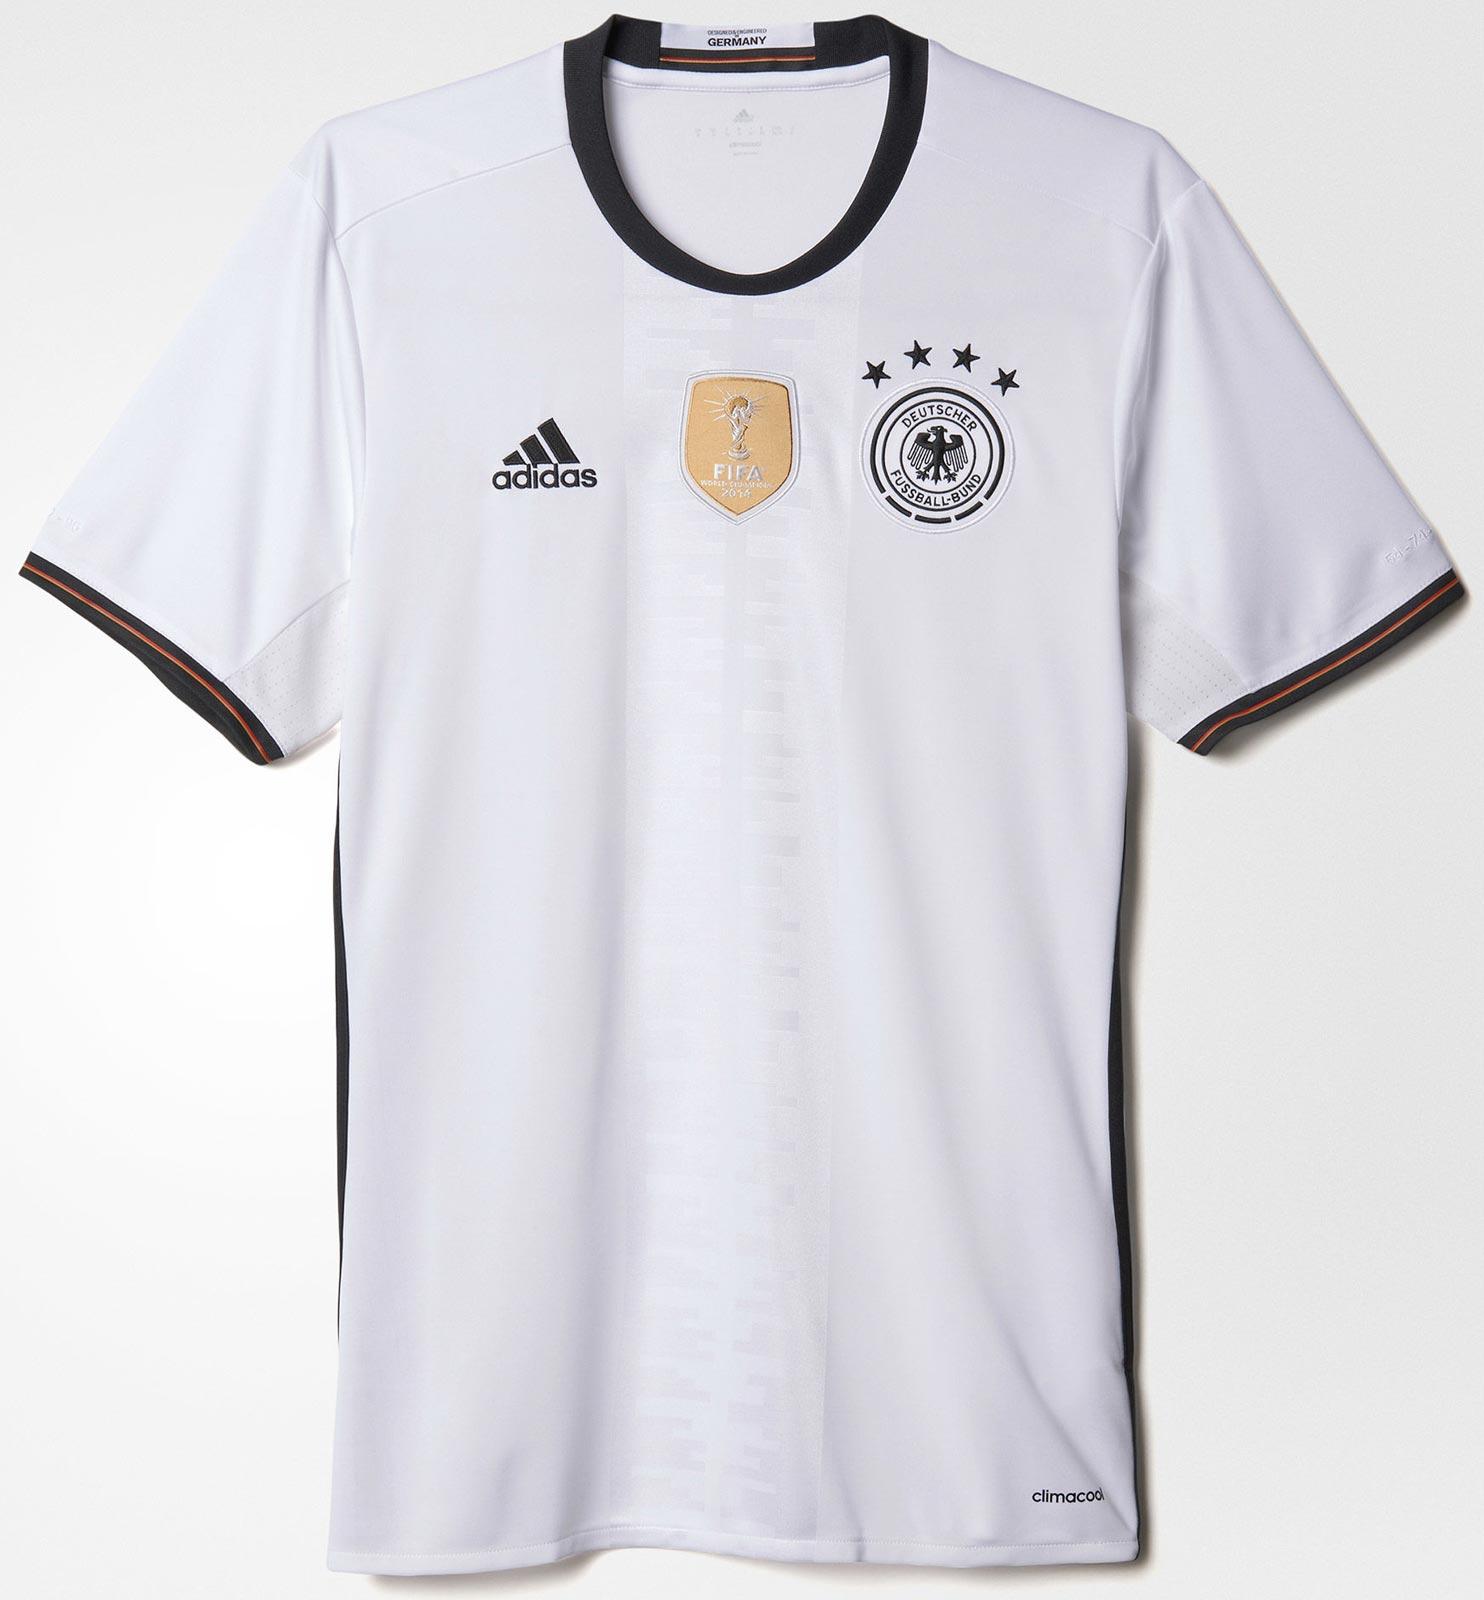 94d77e2fd Adidas Germany Euro 2016 Home Jersey